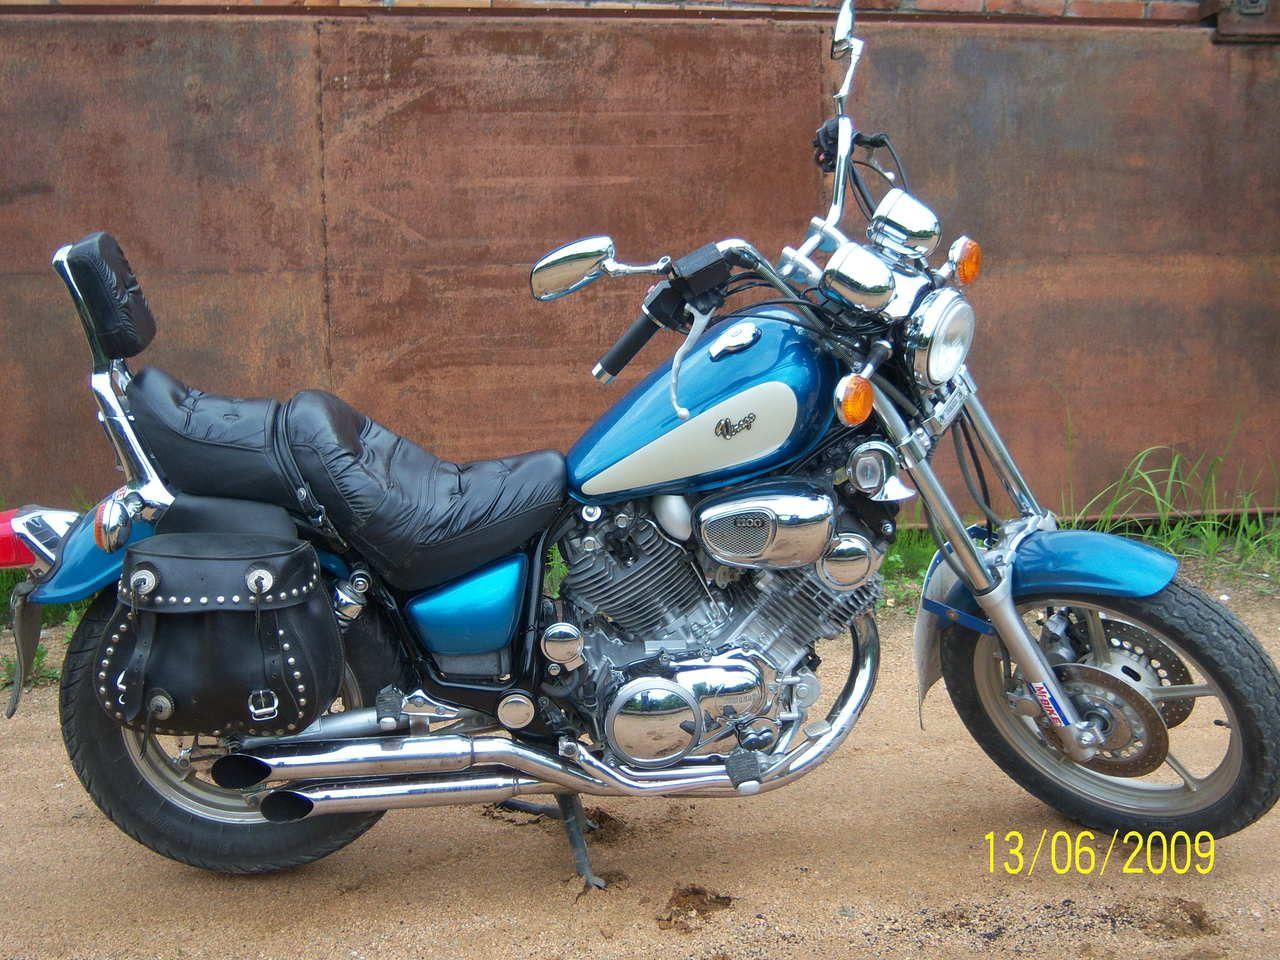 1995 yamaha xv1100 virago motorbike yamaha yamaha. Black Bedroom Furniture Sets. Home Design Ideas